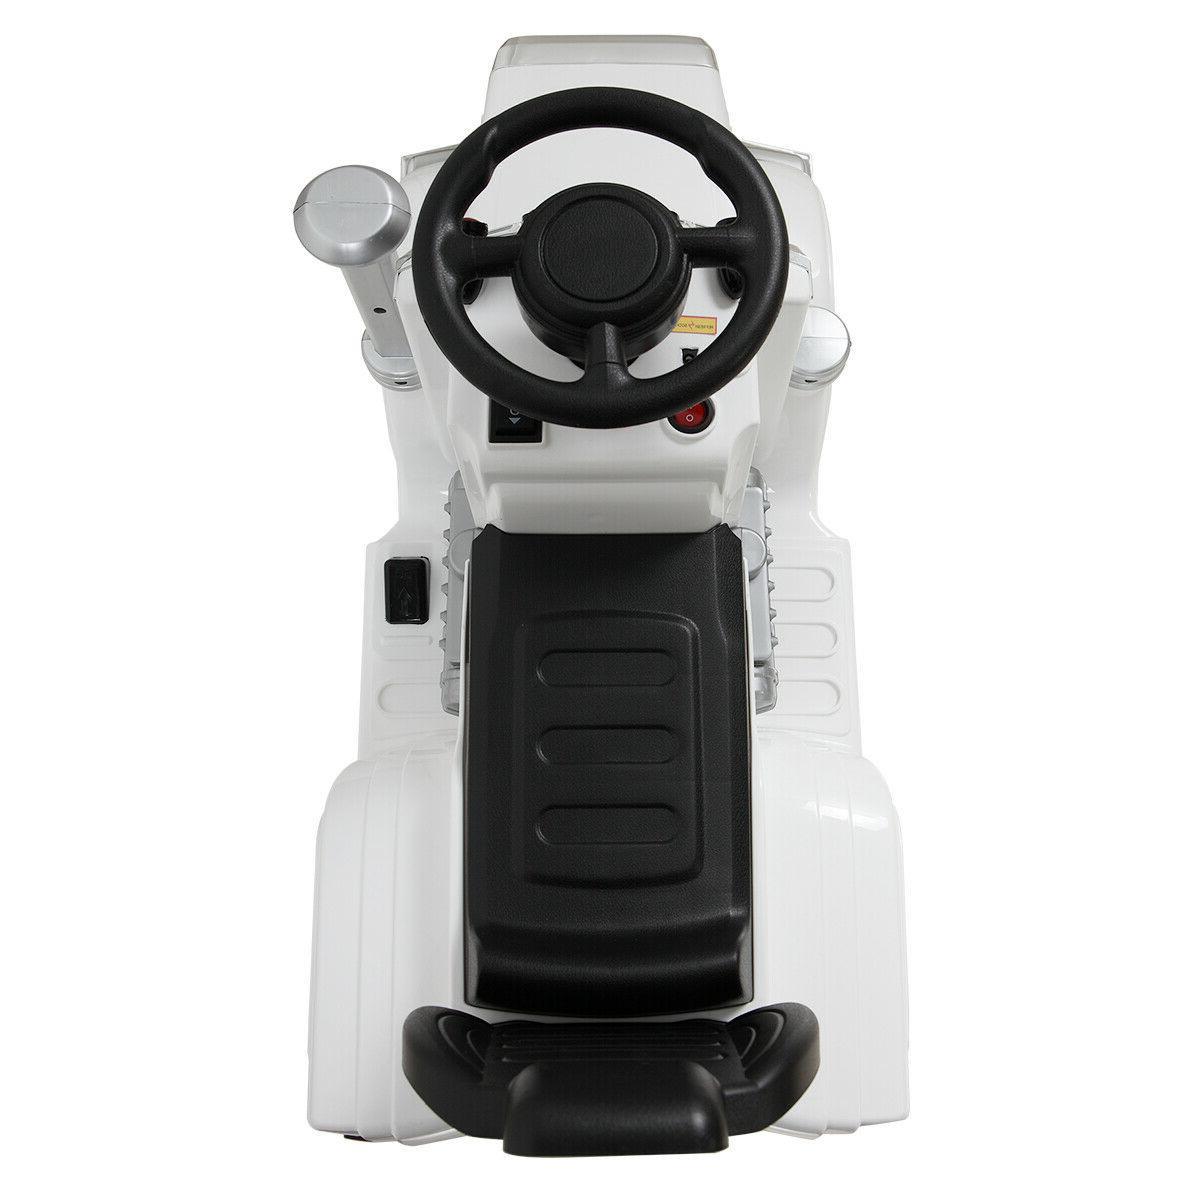 White Ride Car MP3 Light Toy